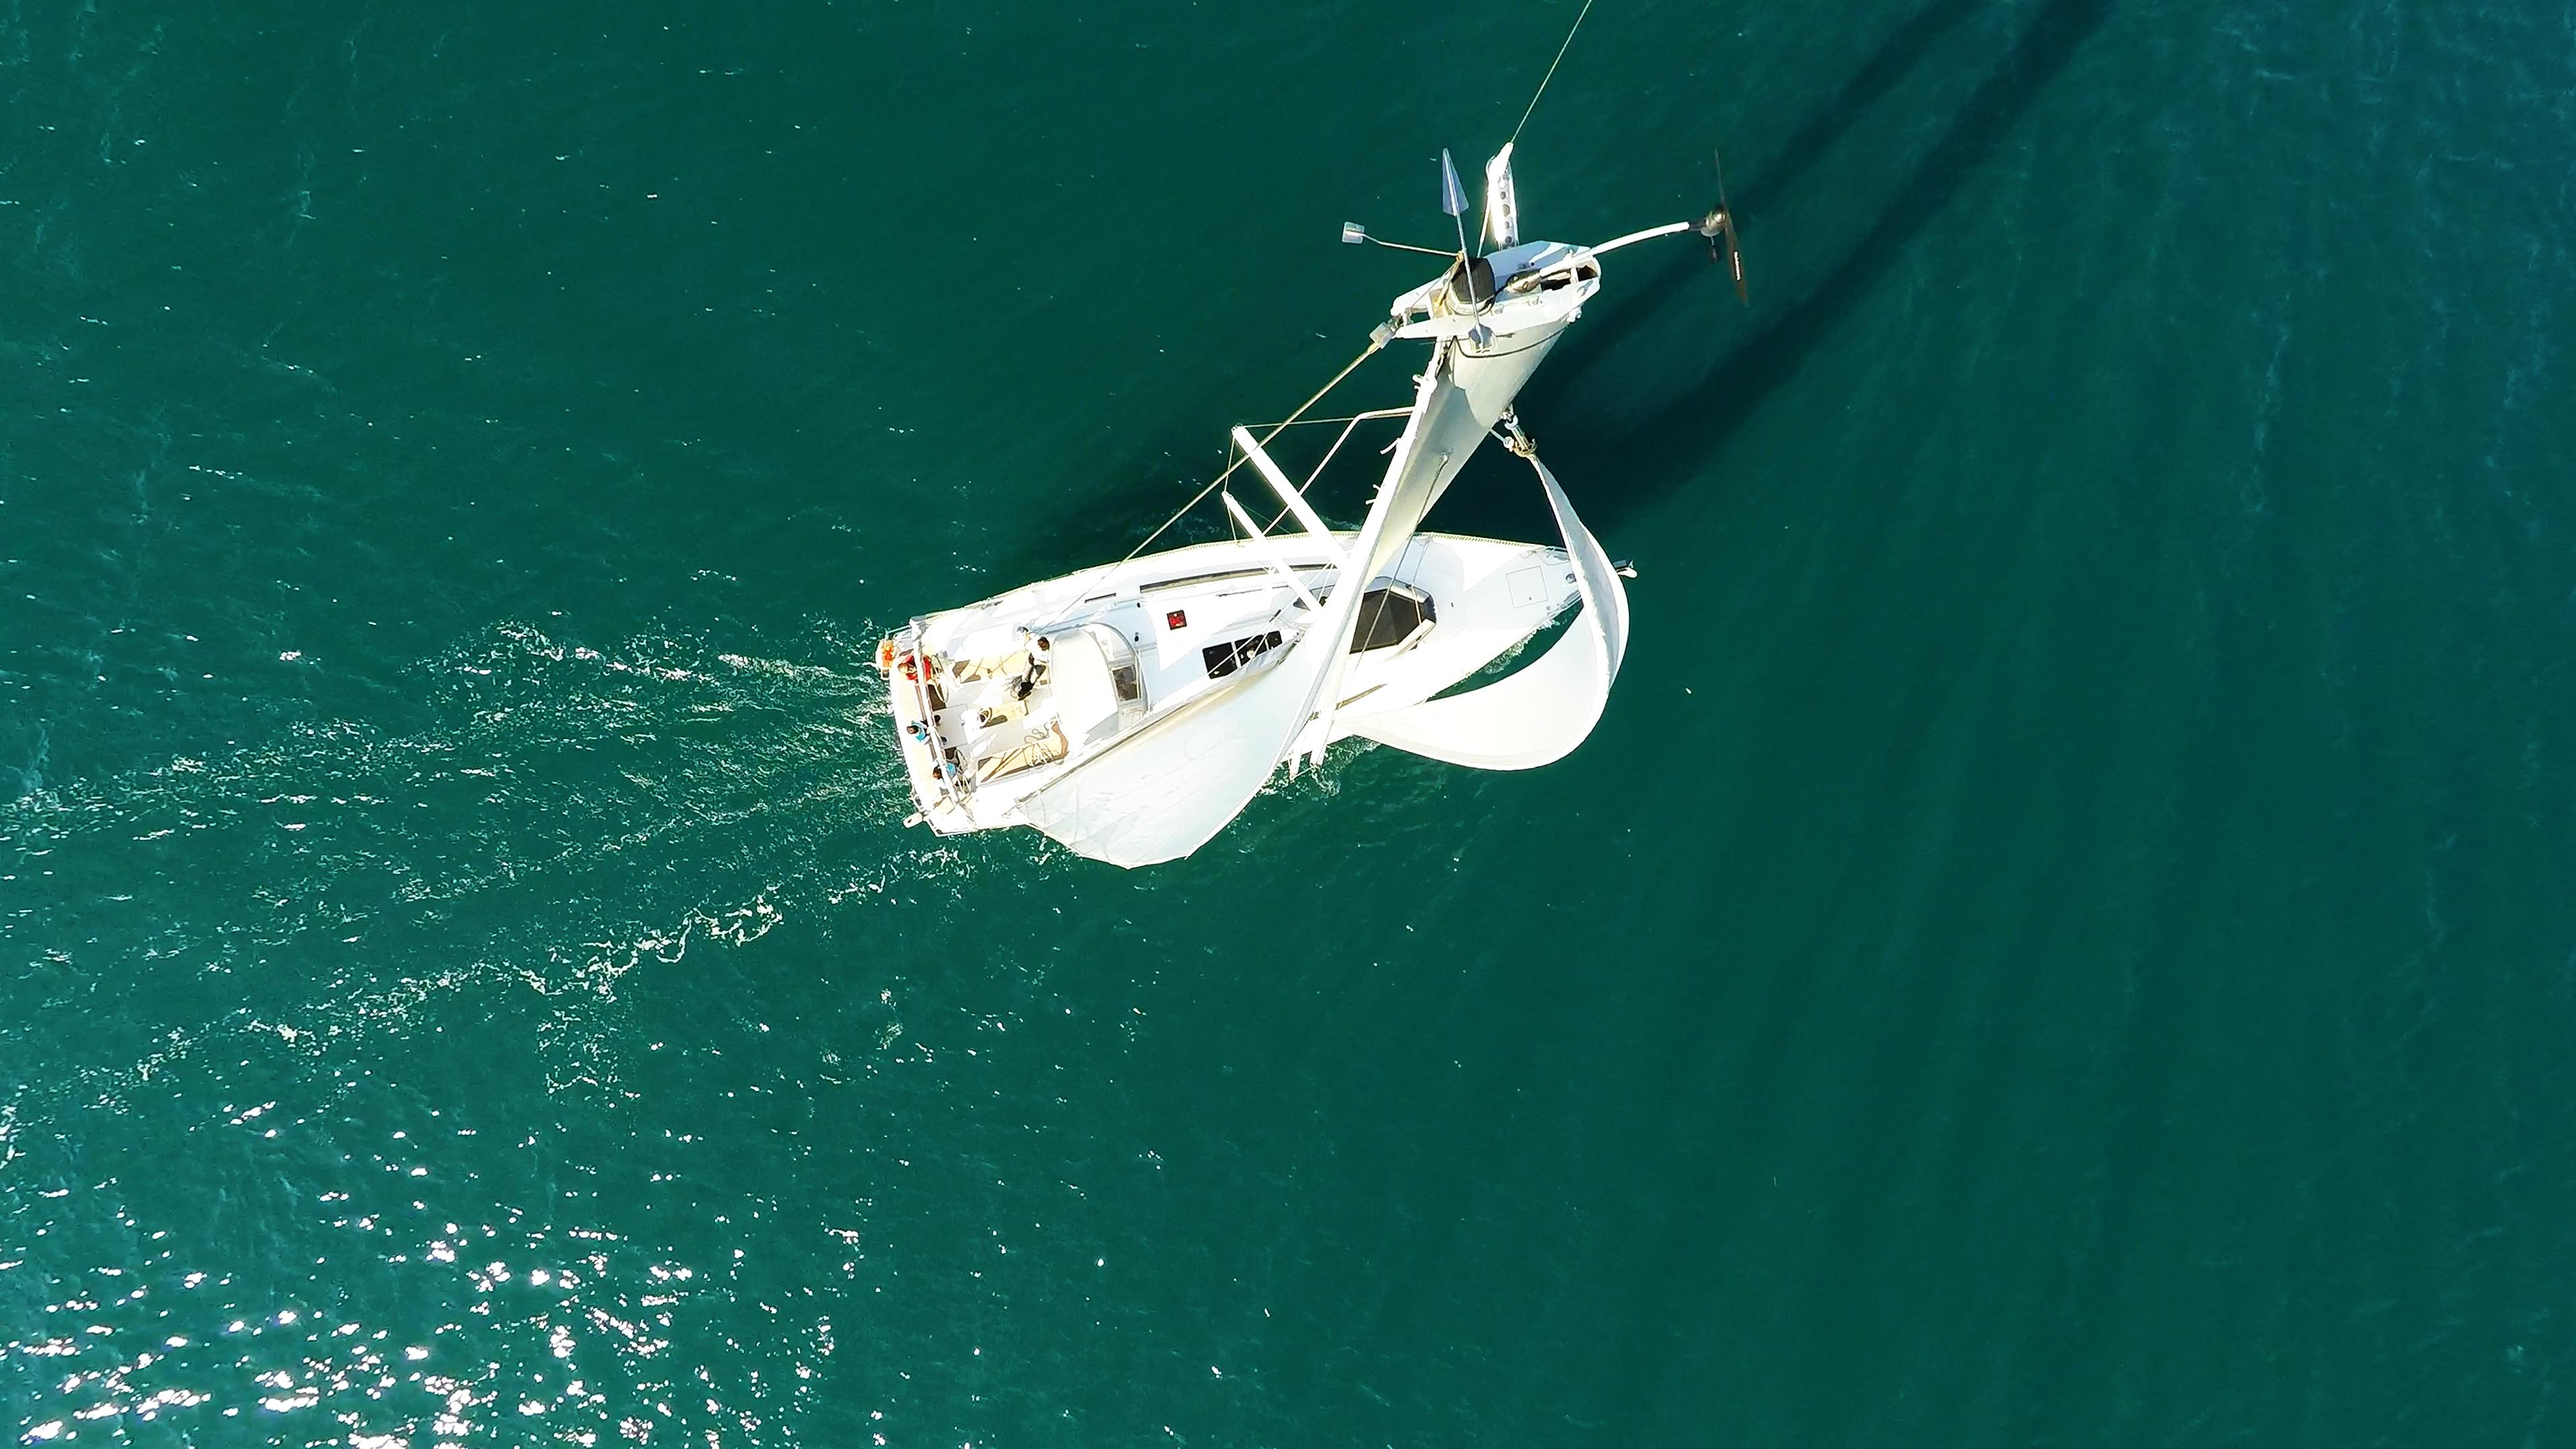 barcha a vela bavaria 46 yacht a vela dal cielo cima dell'albero